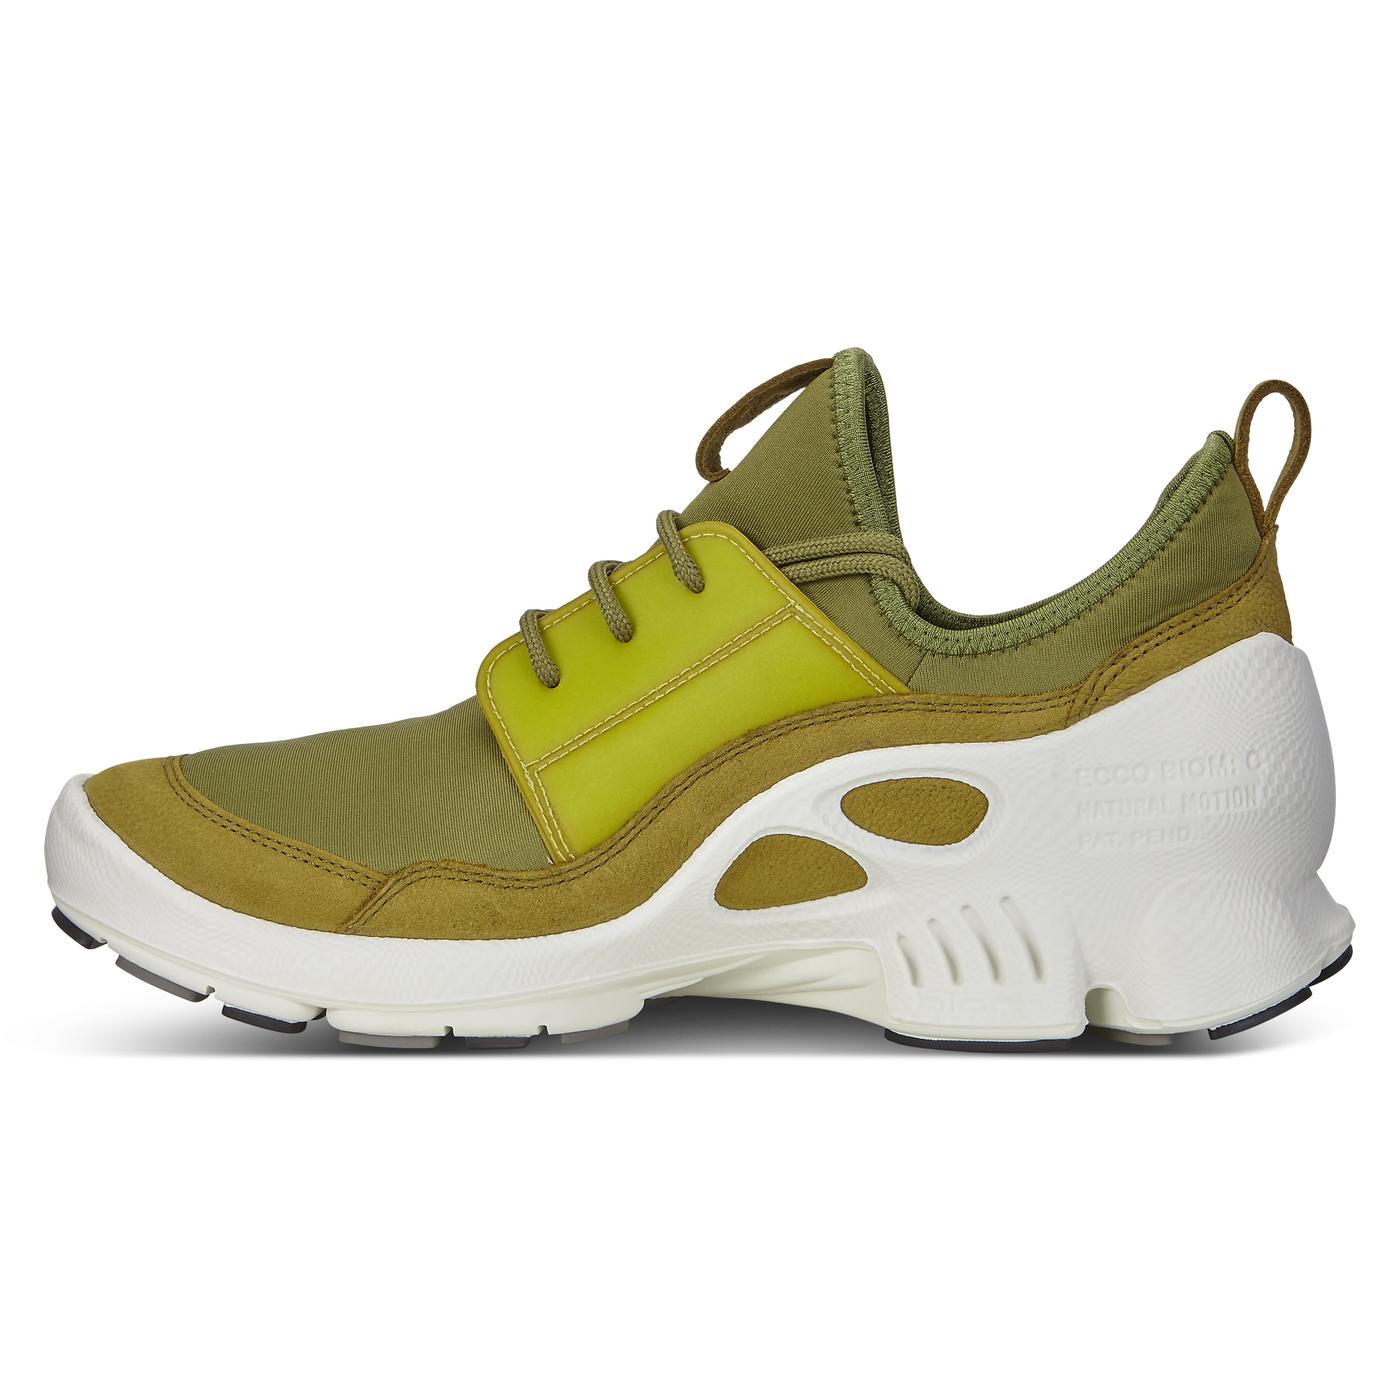 ECCO BIOM C 3.0 Mens Premium Sneaker